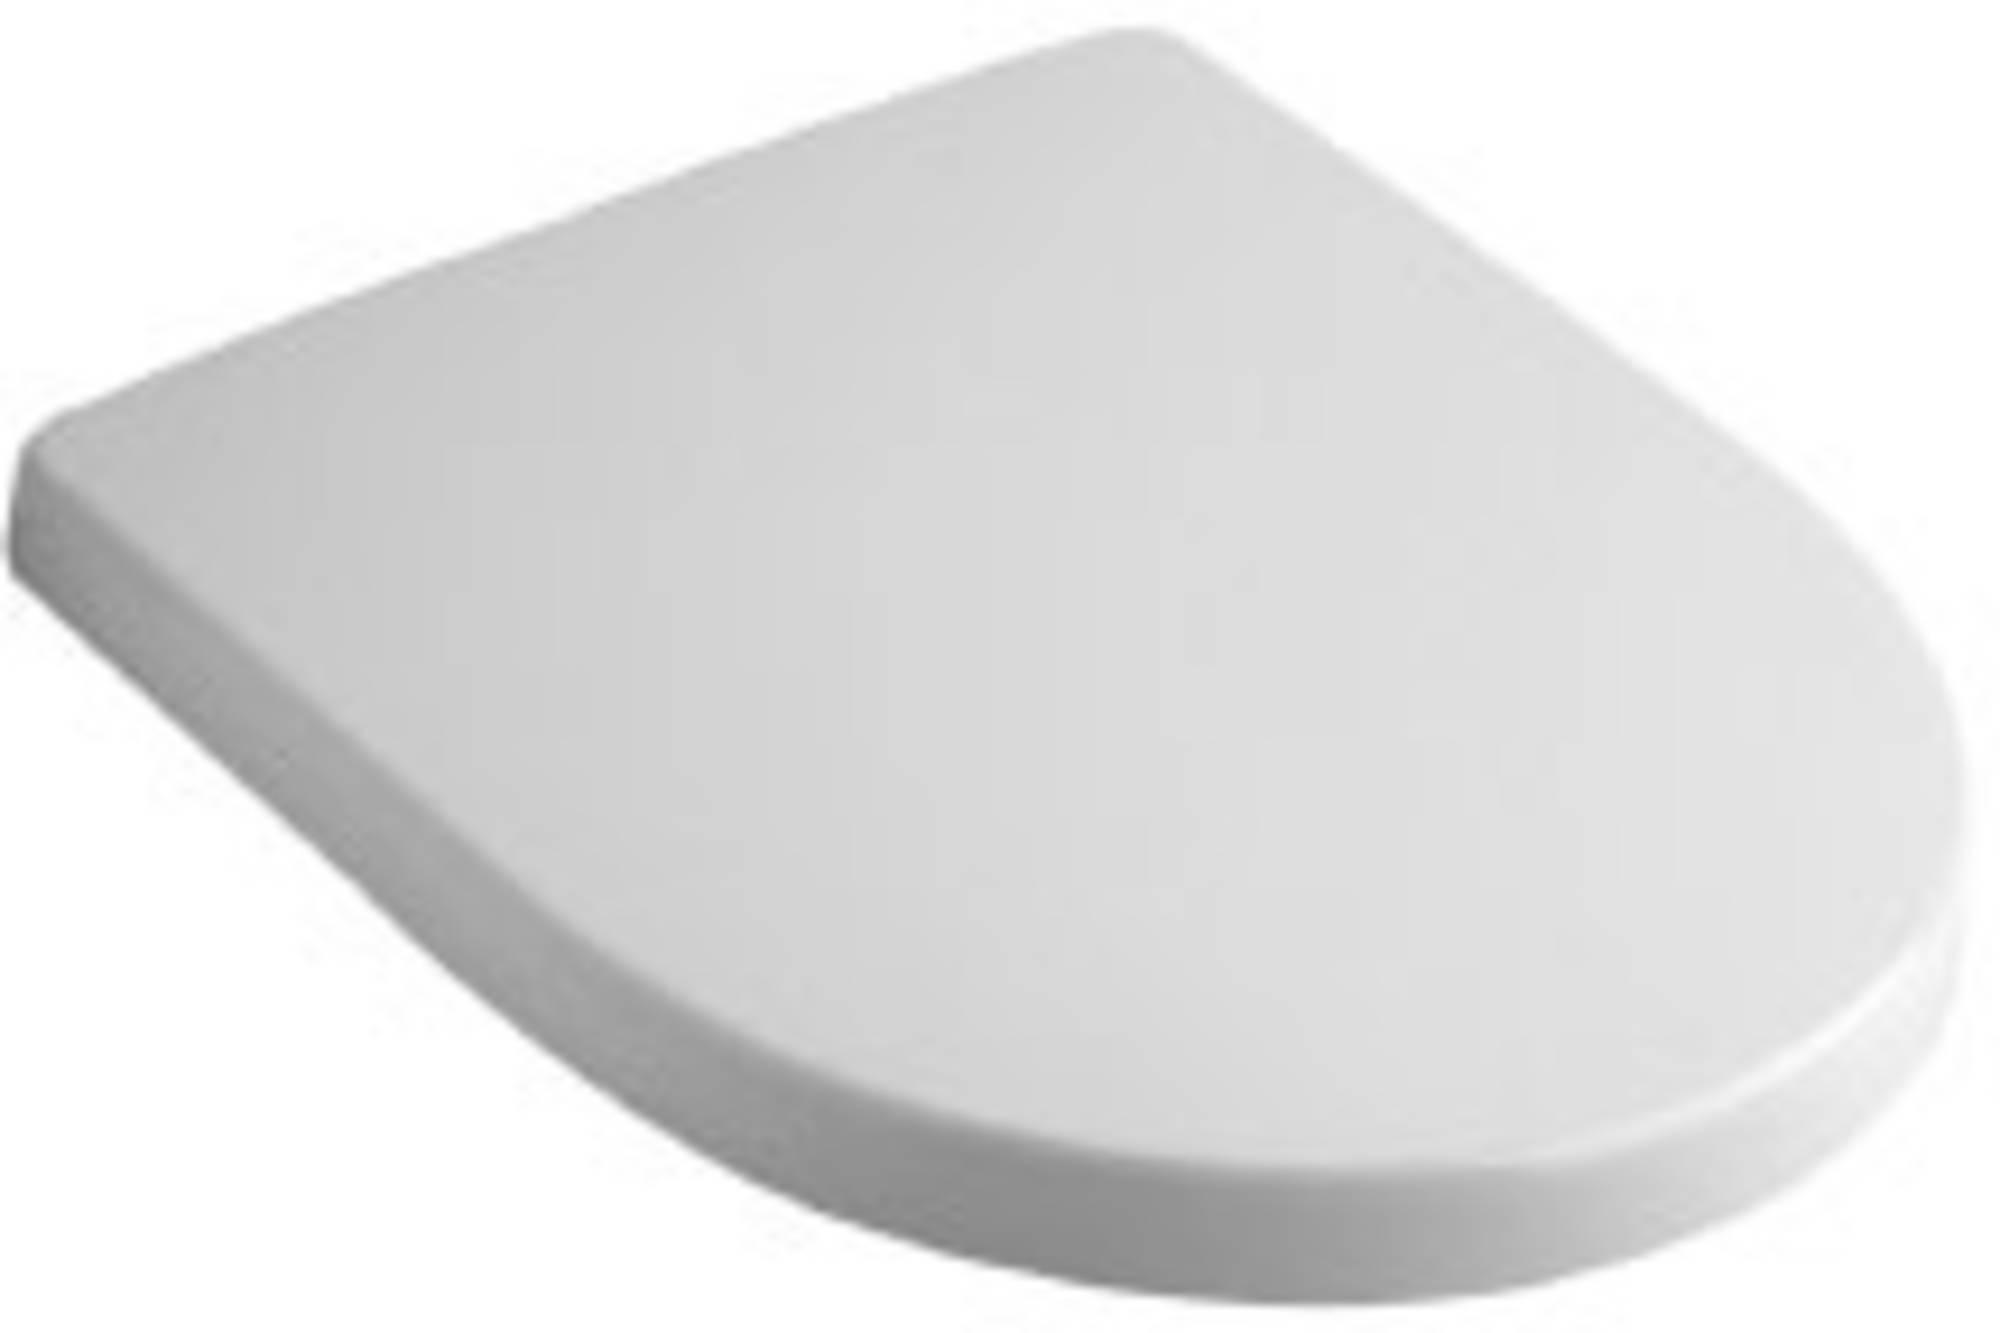 Sphinx Serie 300 basic topfix closetzitting met deksel softclosing, wit